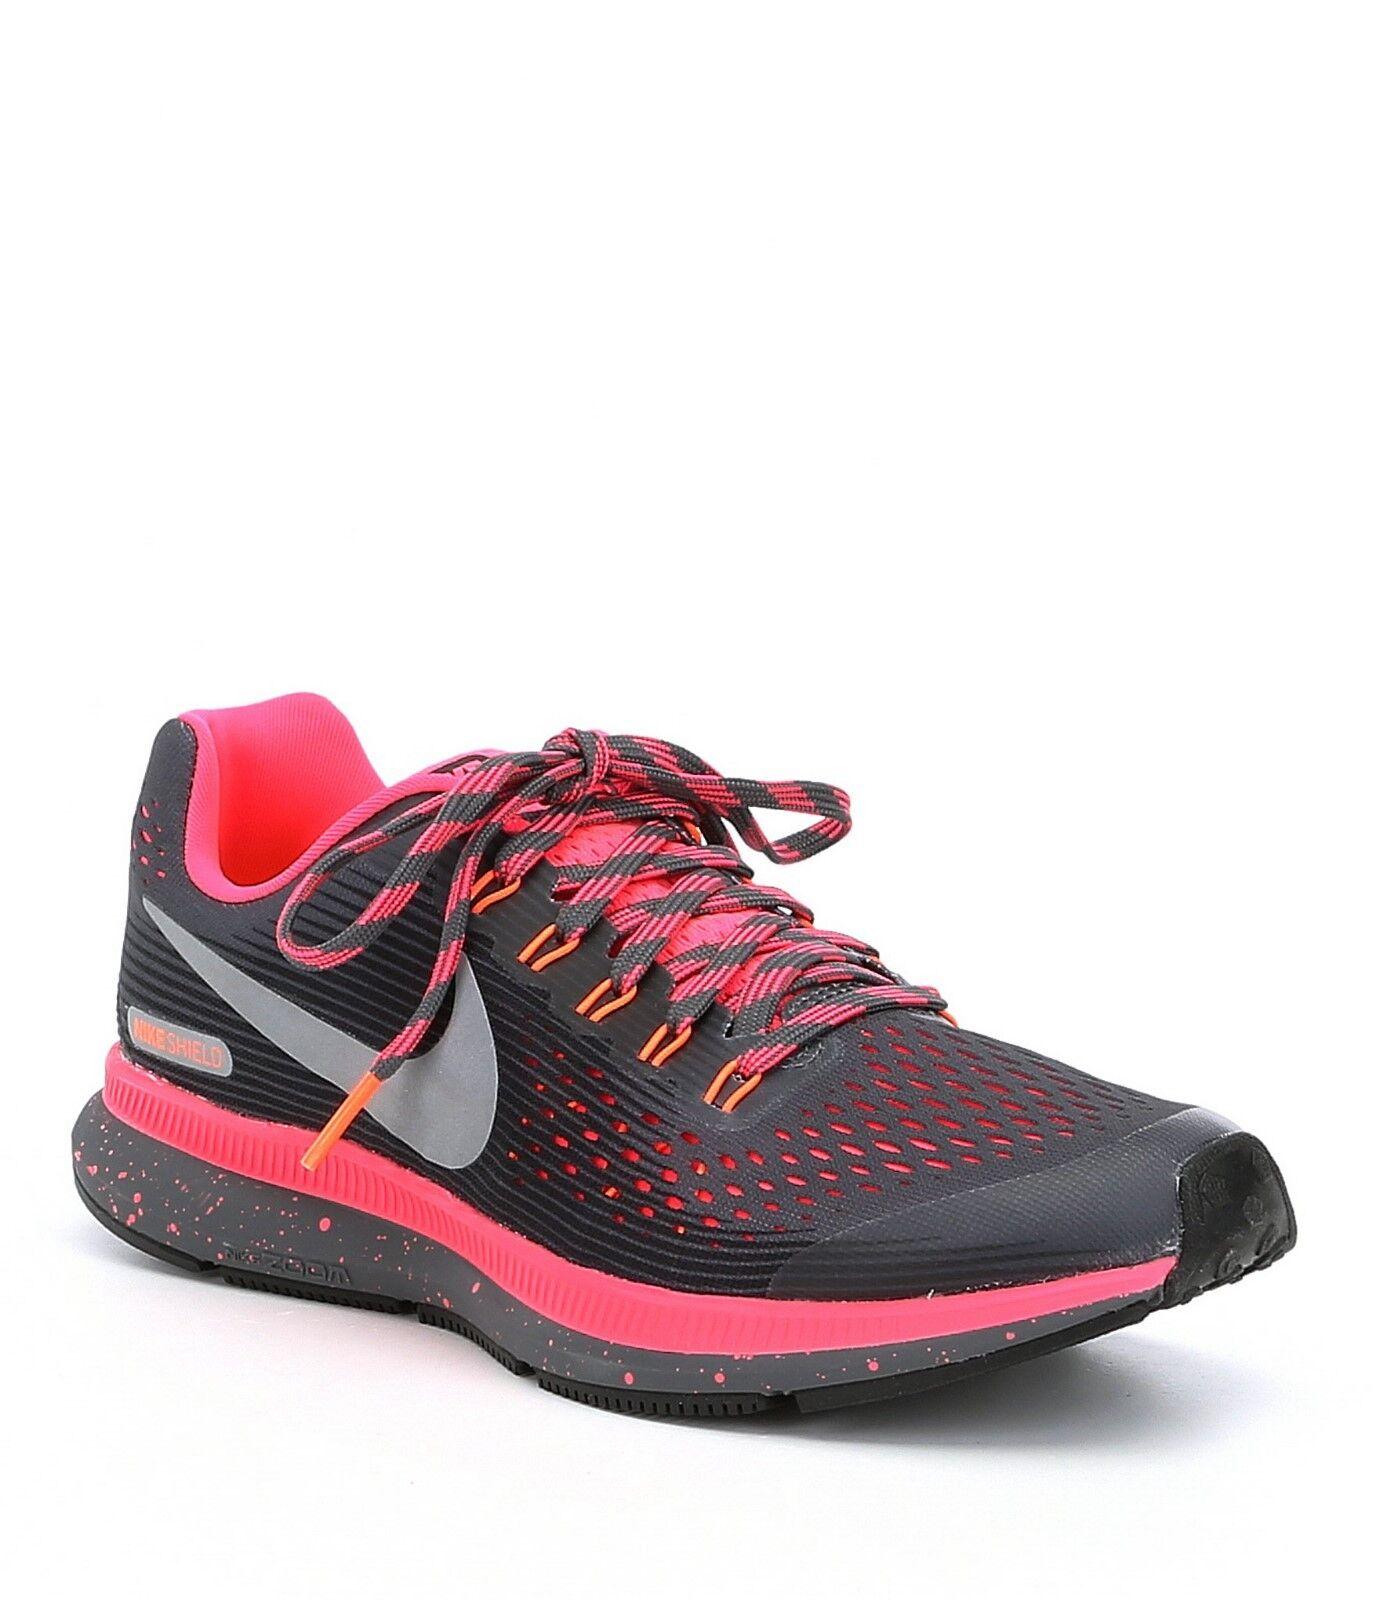 Nike zoom pegasus 34 scudo gs grigio scuro con 922849 sz 001) = wmns 8